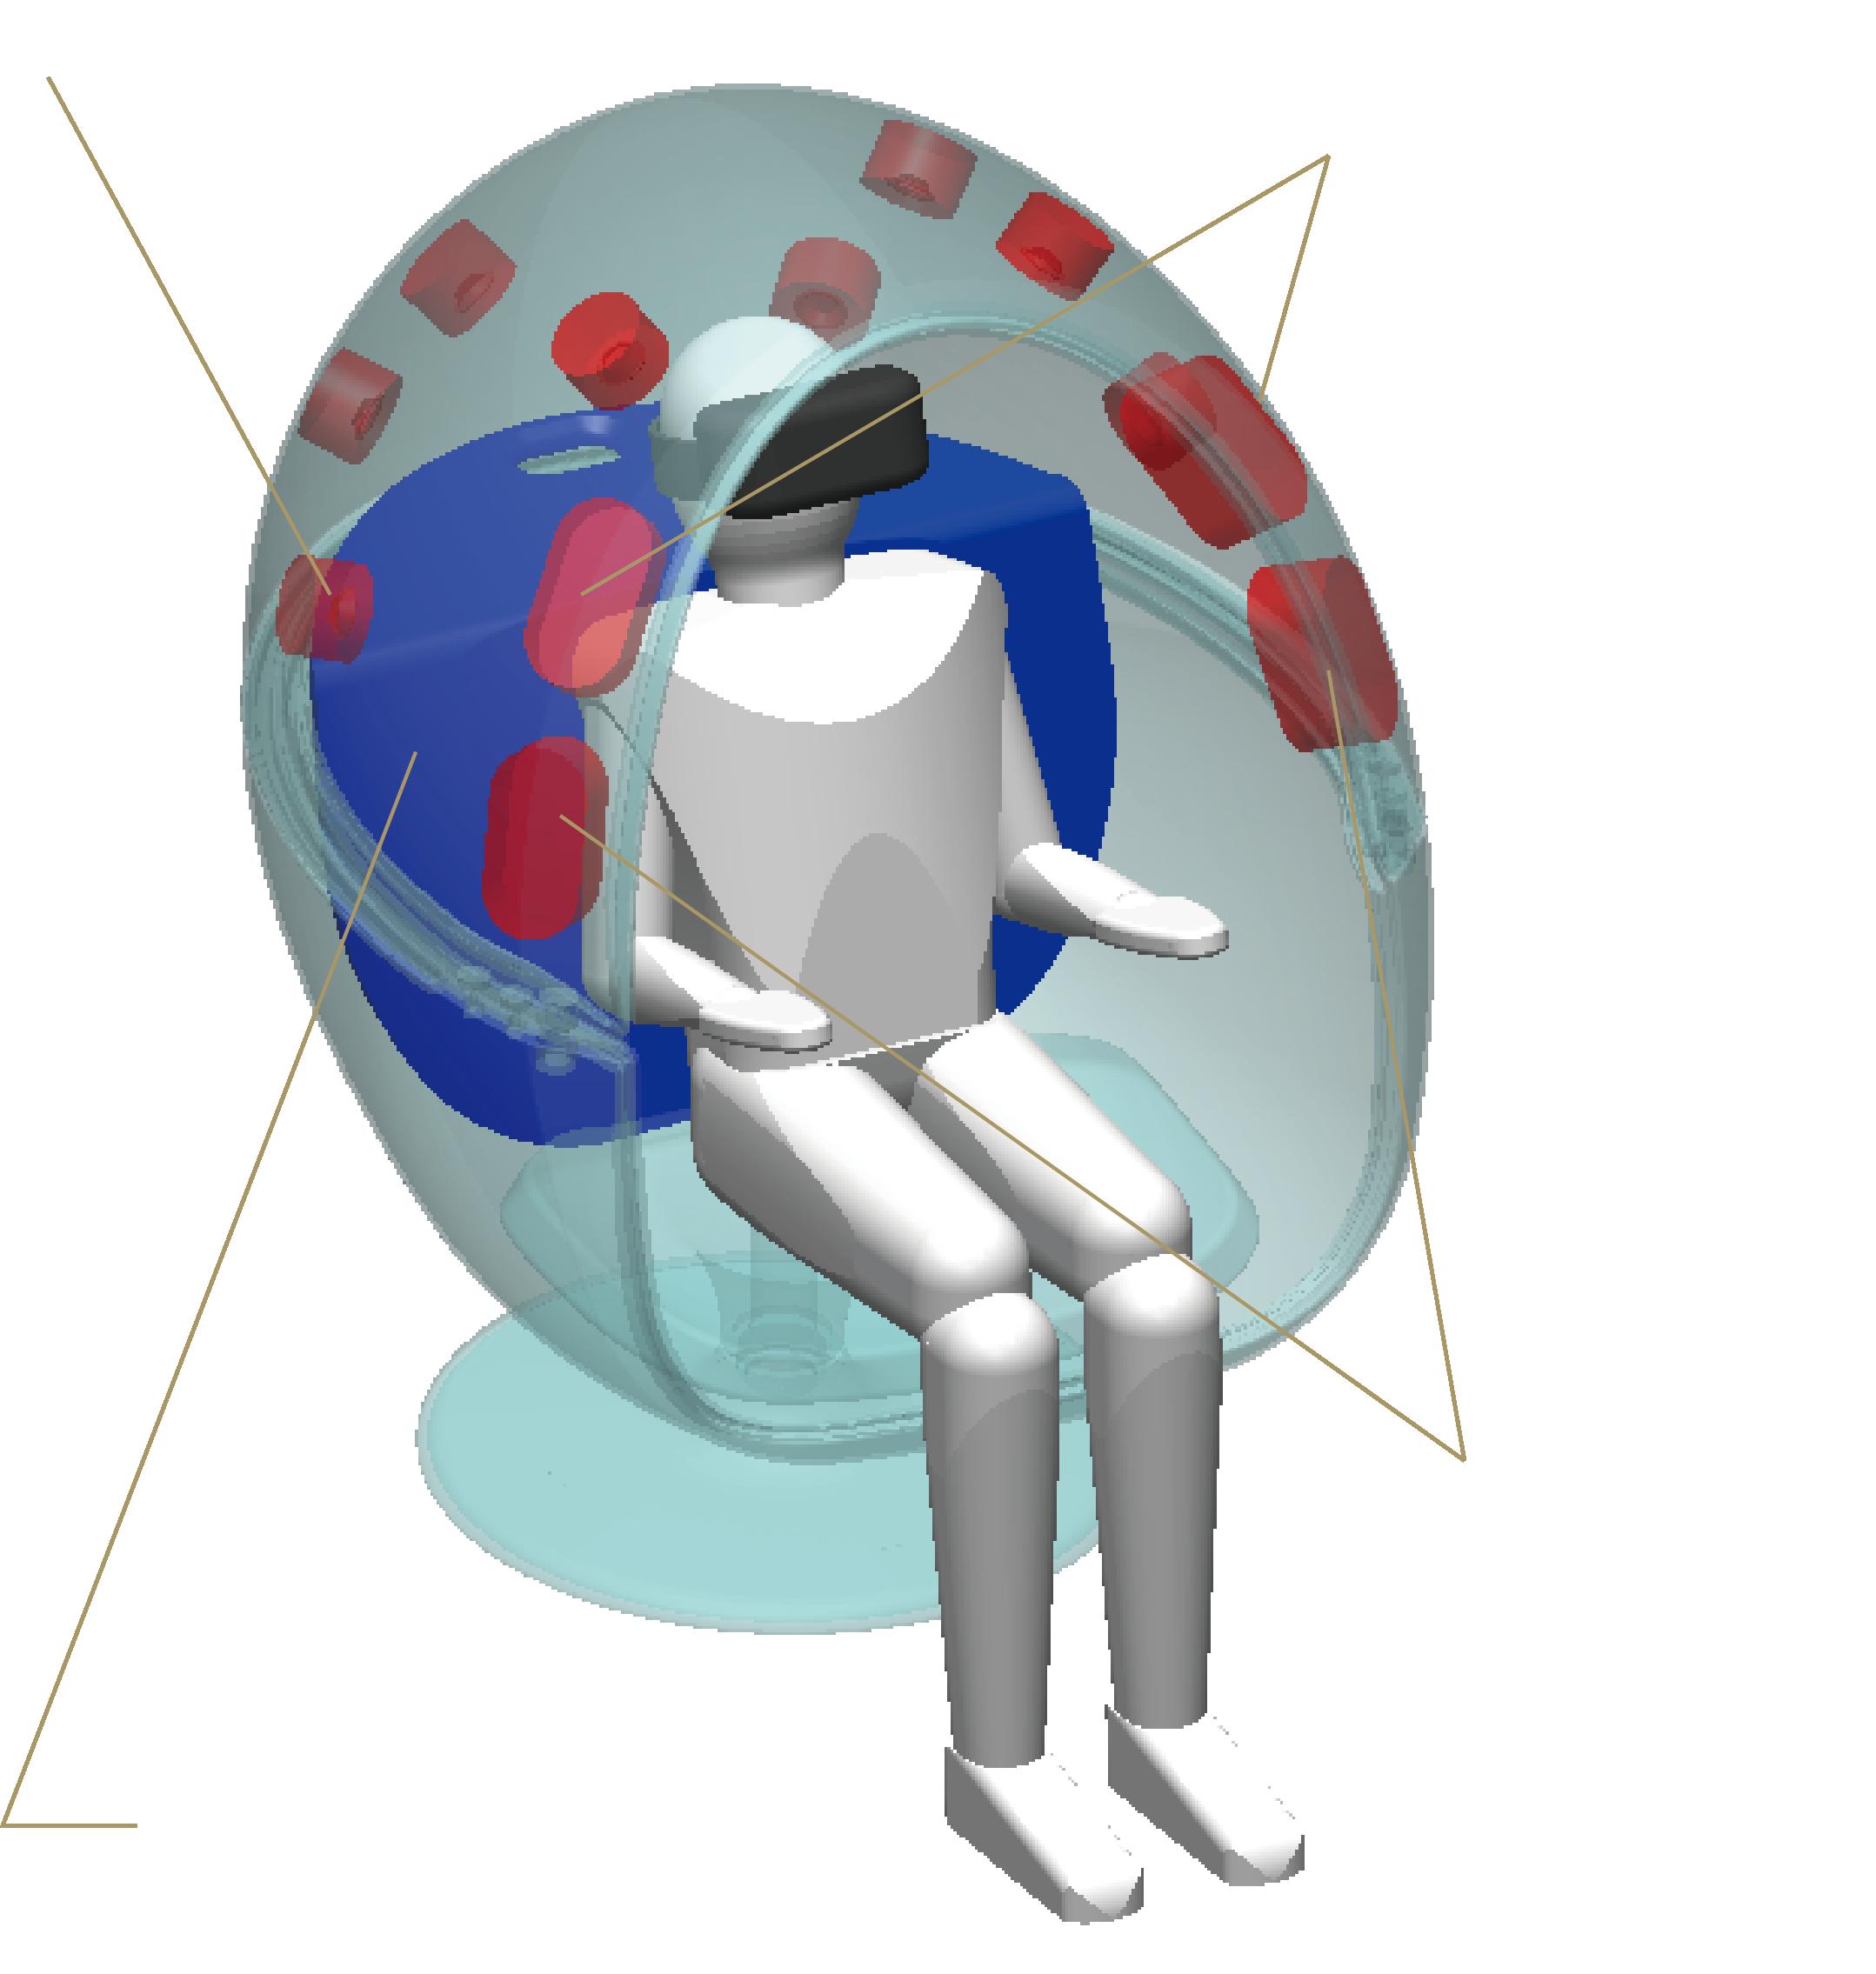 VRS1のスピーカーユニット配置イメージ図